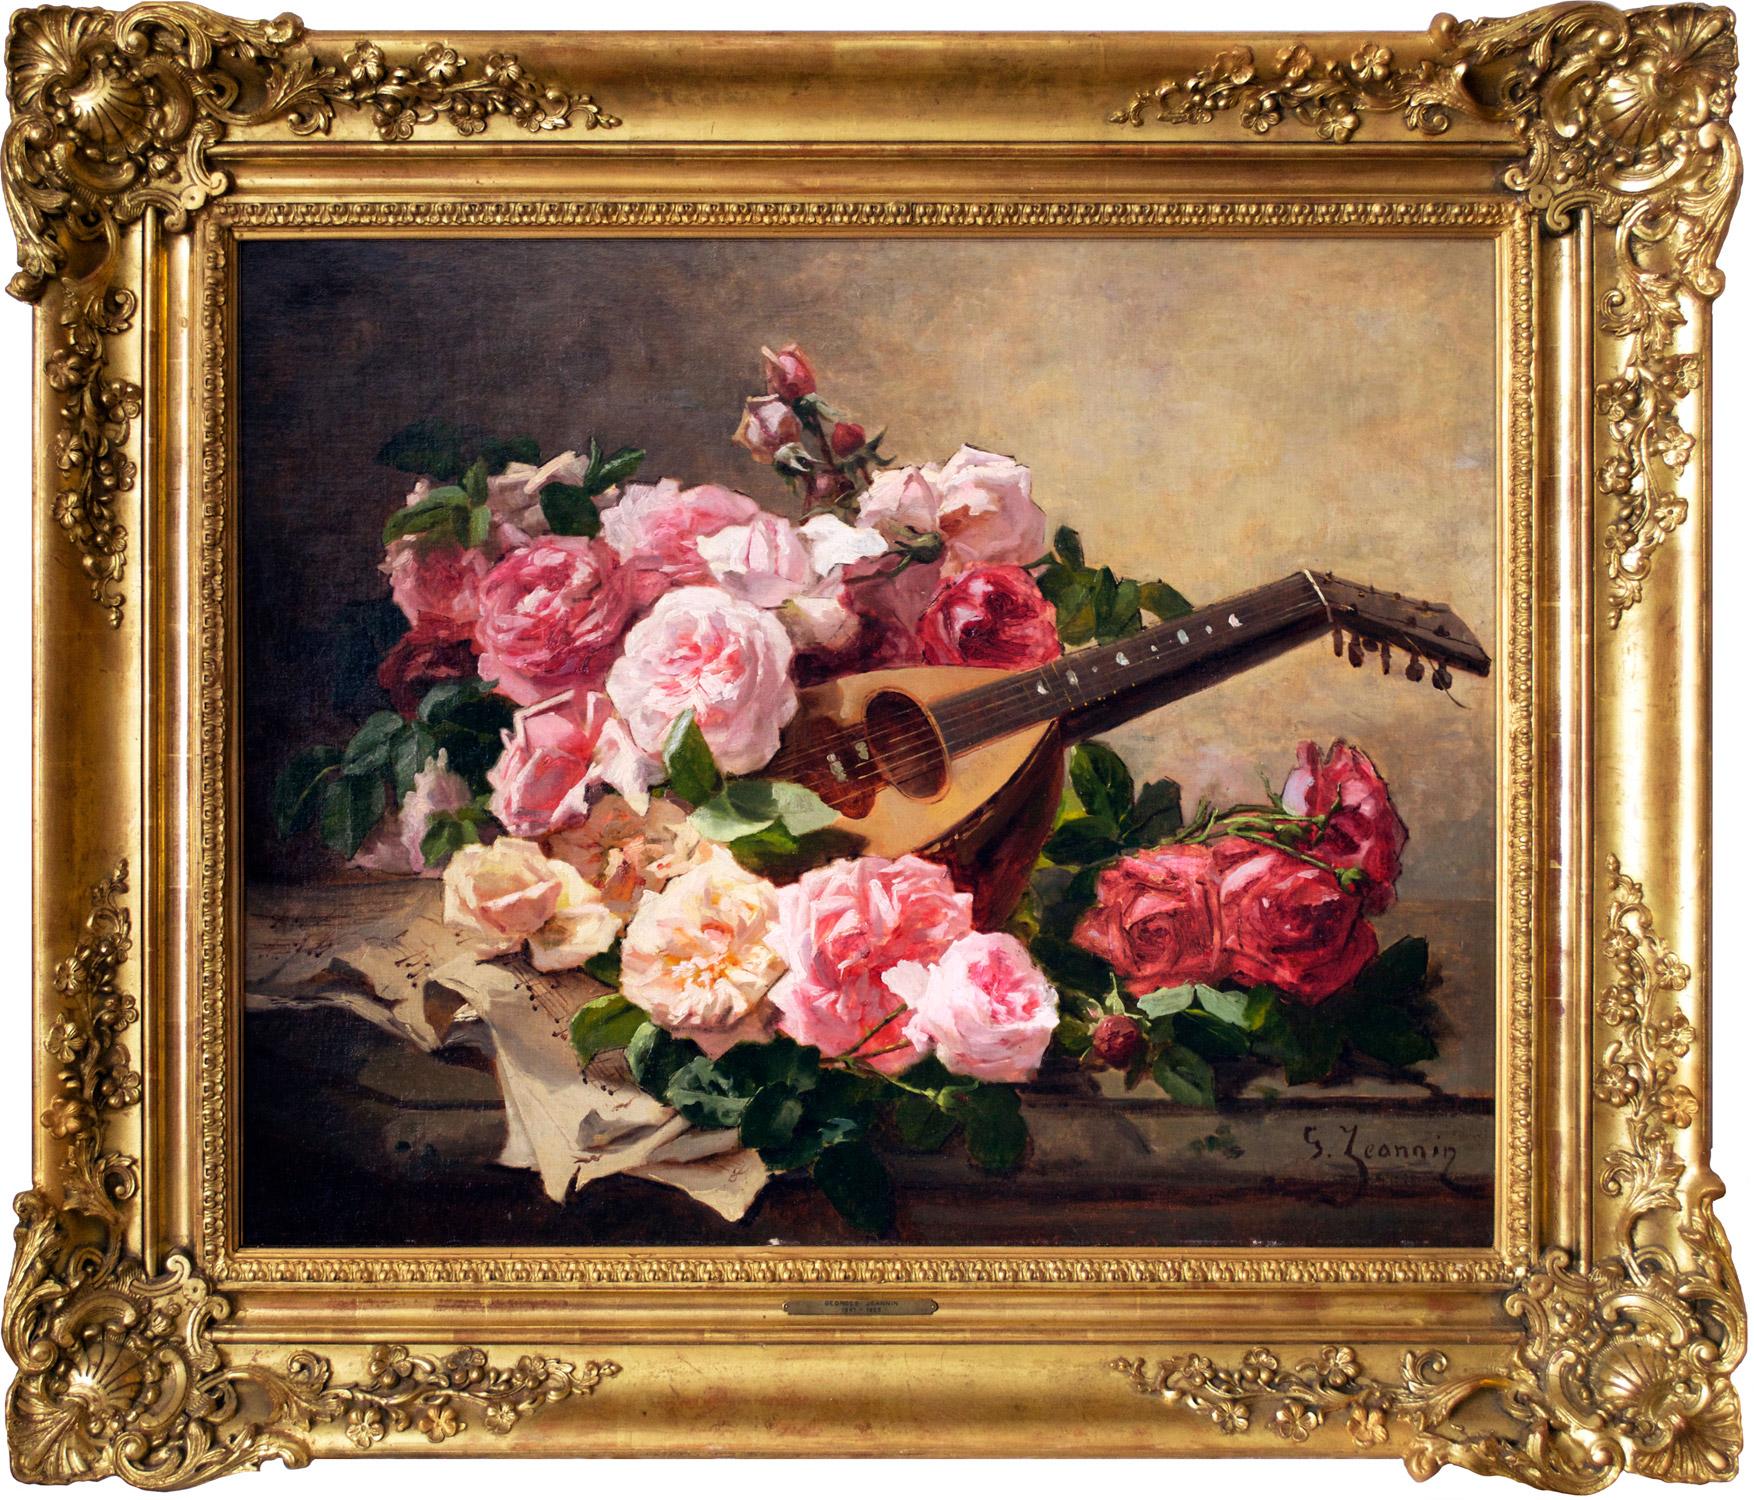 Still life with Roses and Mandolin, Circa 1900